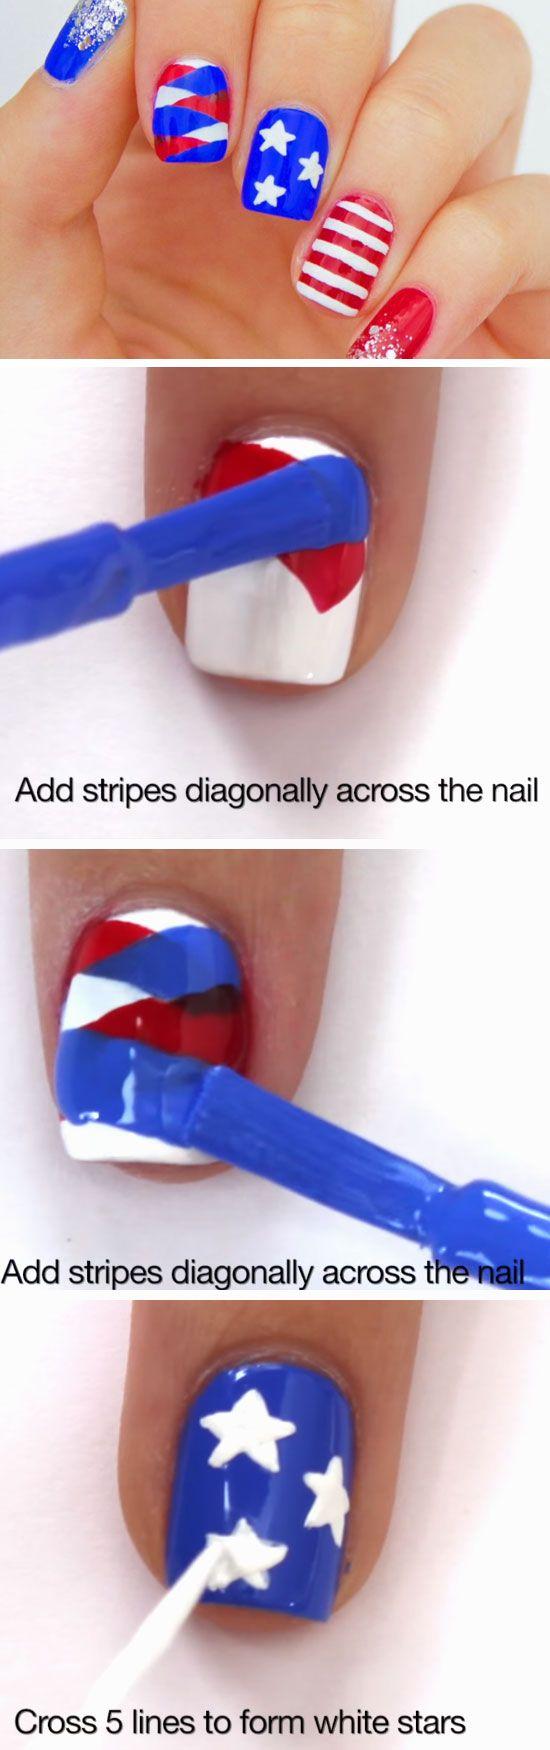 Amazingly cute and fabulous nail art designs - 18 Amazing Fourth Of July Nail Art Designs For Teens